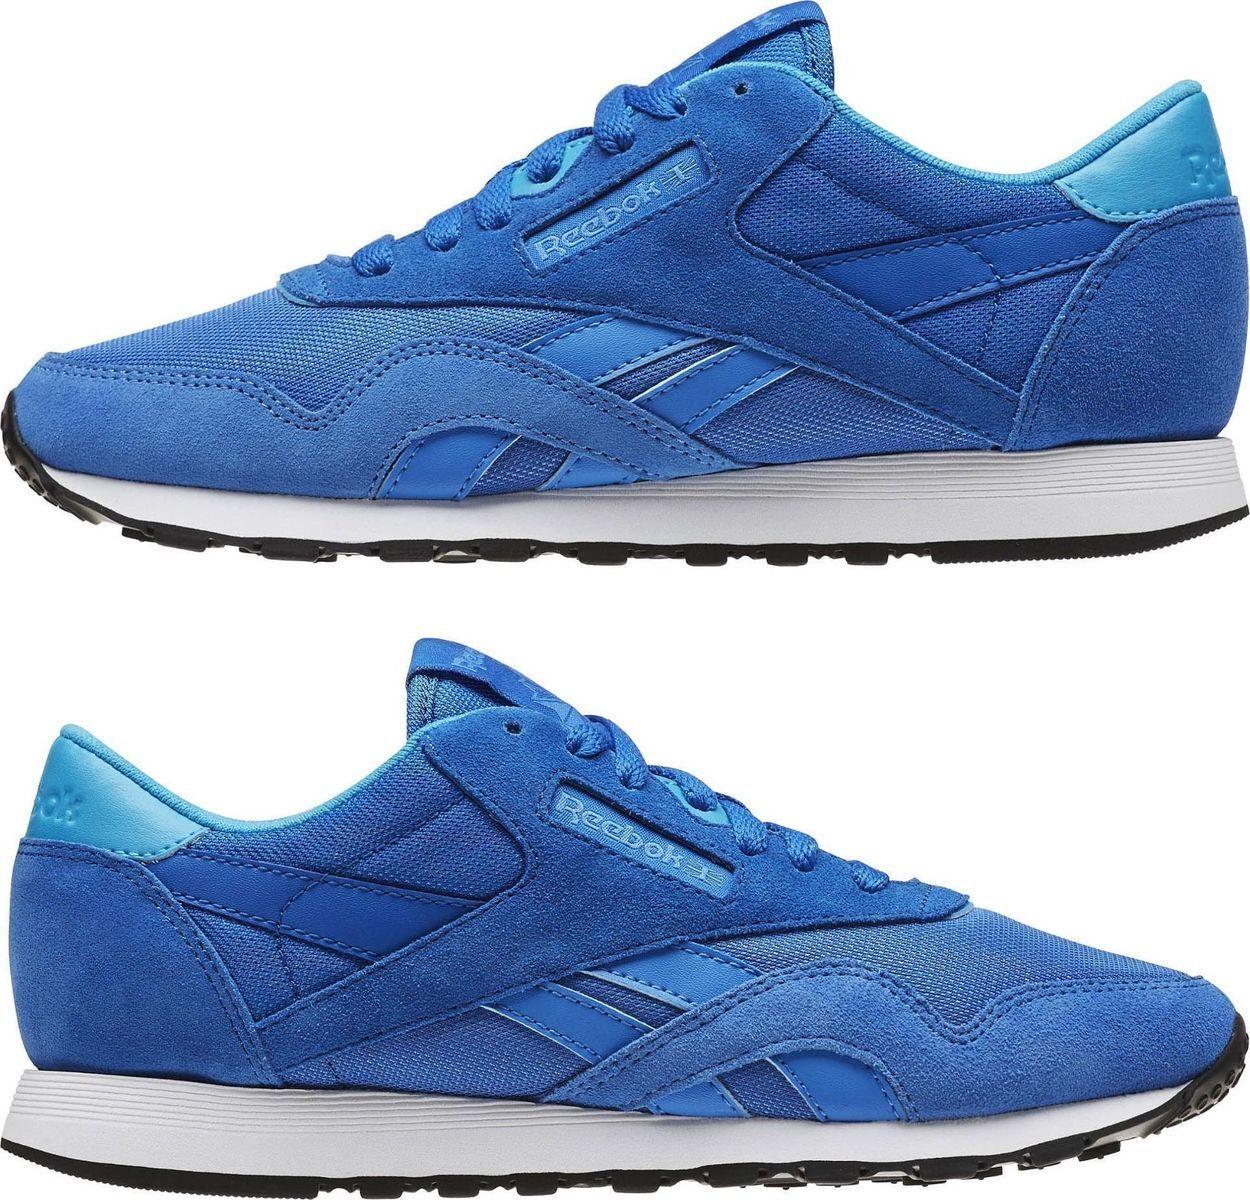 Reebok damen damen Turnschuhe Gr 40 BD1776 Classic Leather Nylon MH Echo Blau Sport